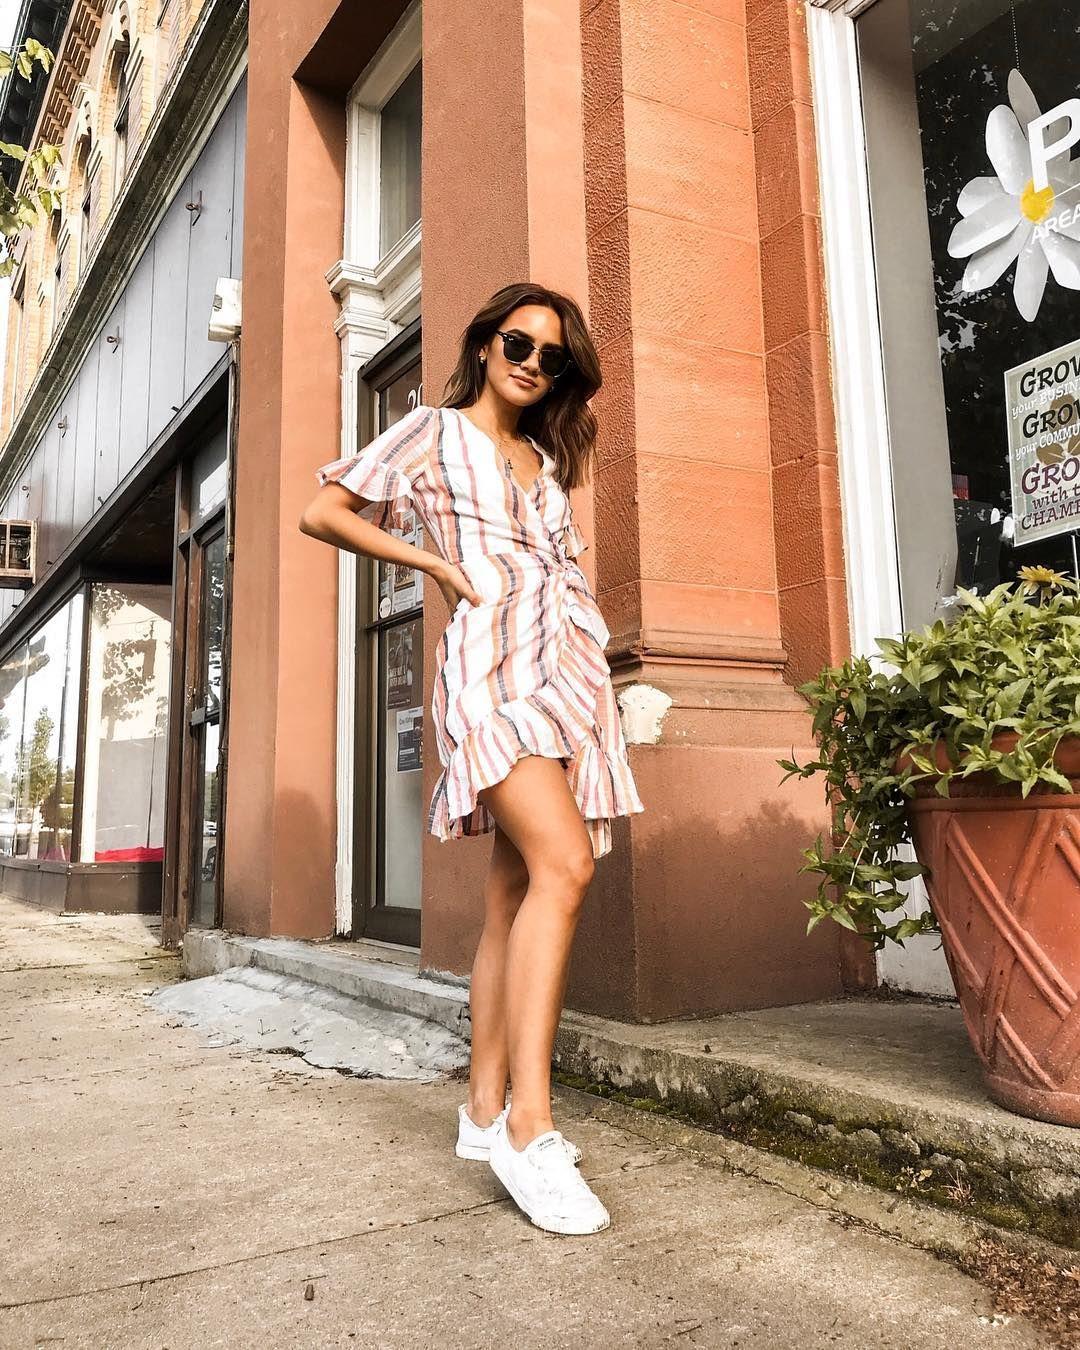 A Summer Wrap Dress And Sneakers Your Weekend Wardrobe In Warmer Temps Multi Striped Ruffle Wrap Fro Tie Front Dress Dress With Sneakers Summer Wrap Dress [ 1350 x 1080 Pixel ]